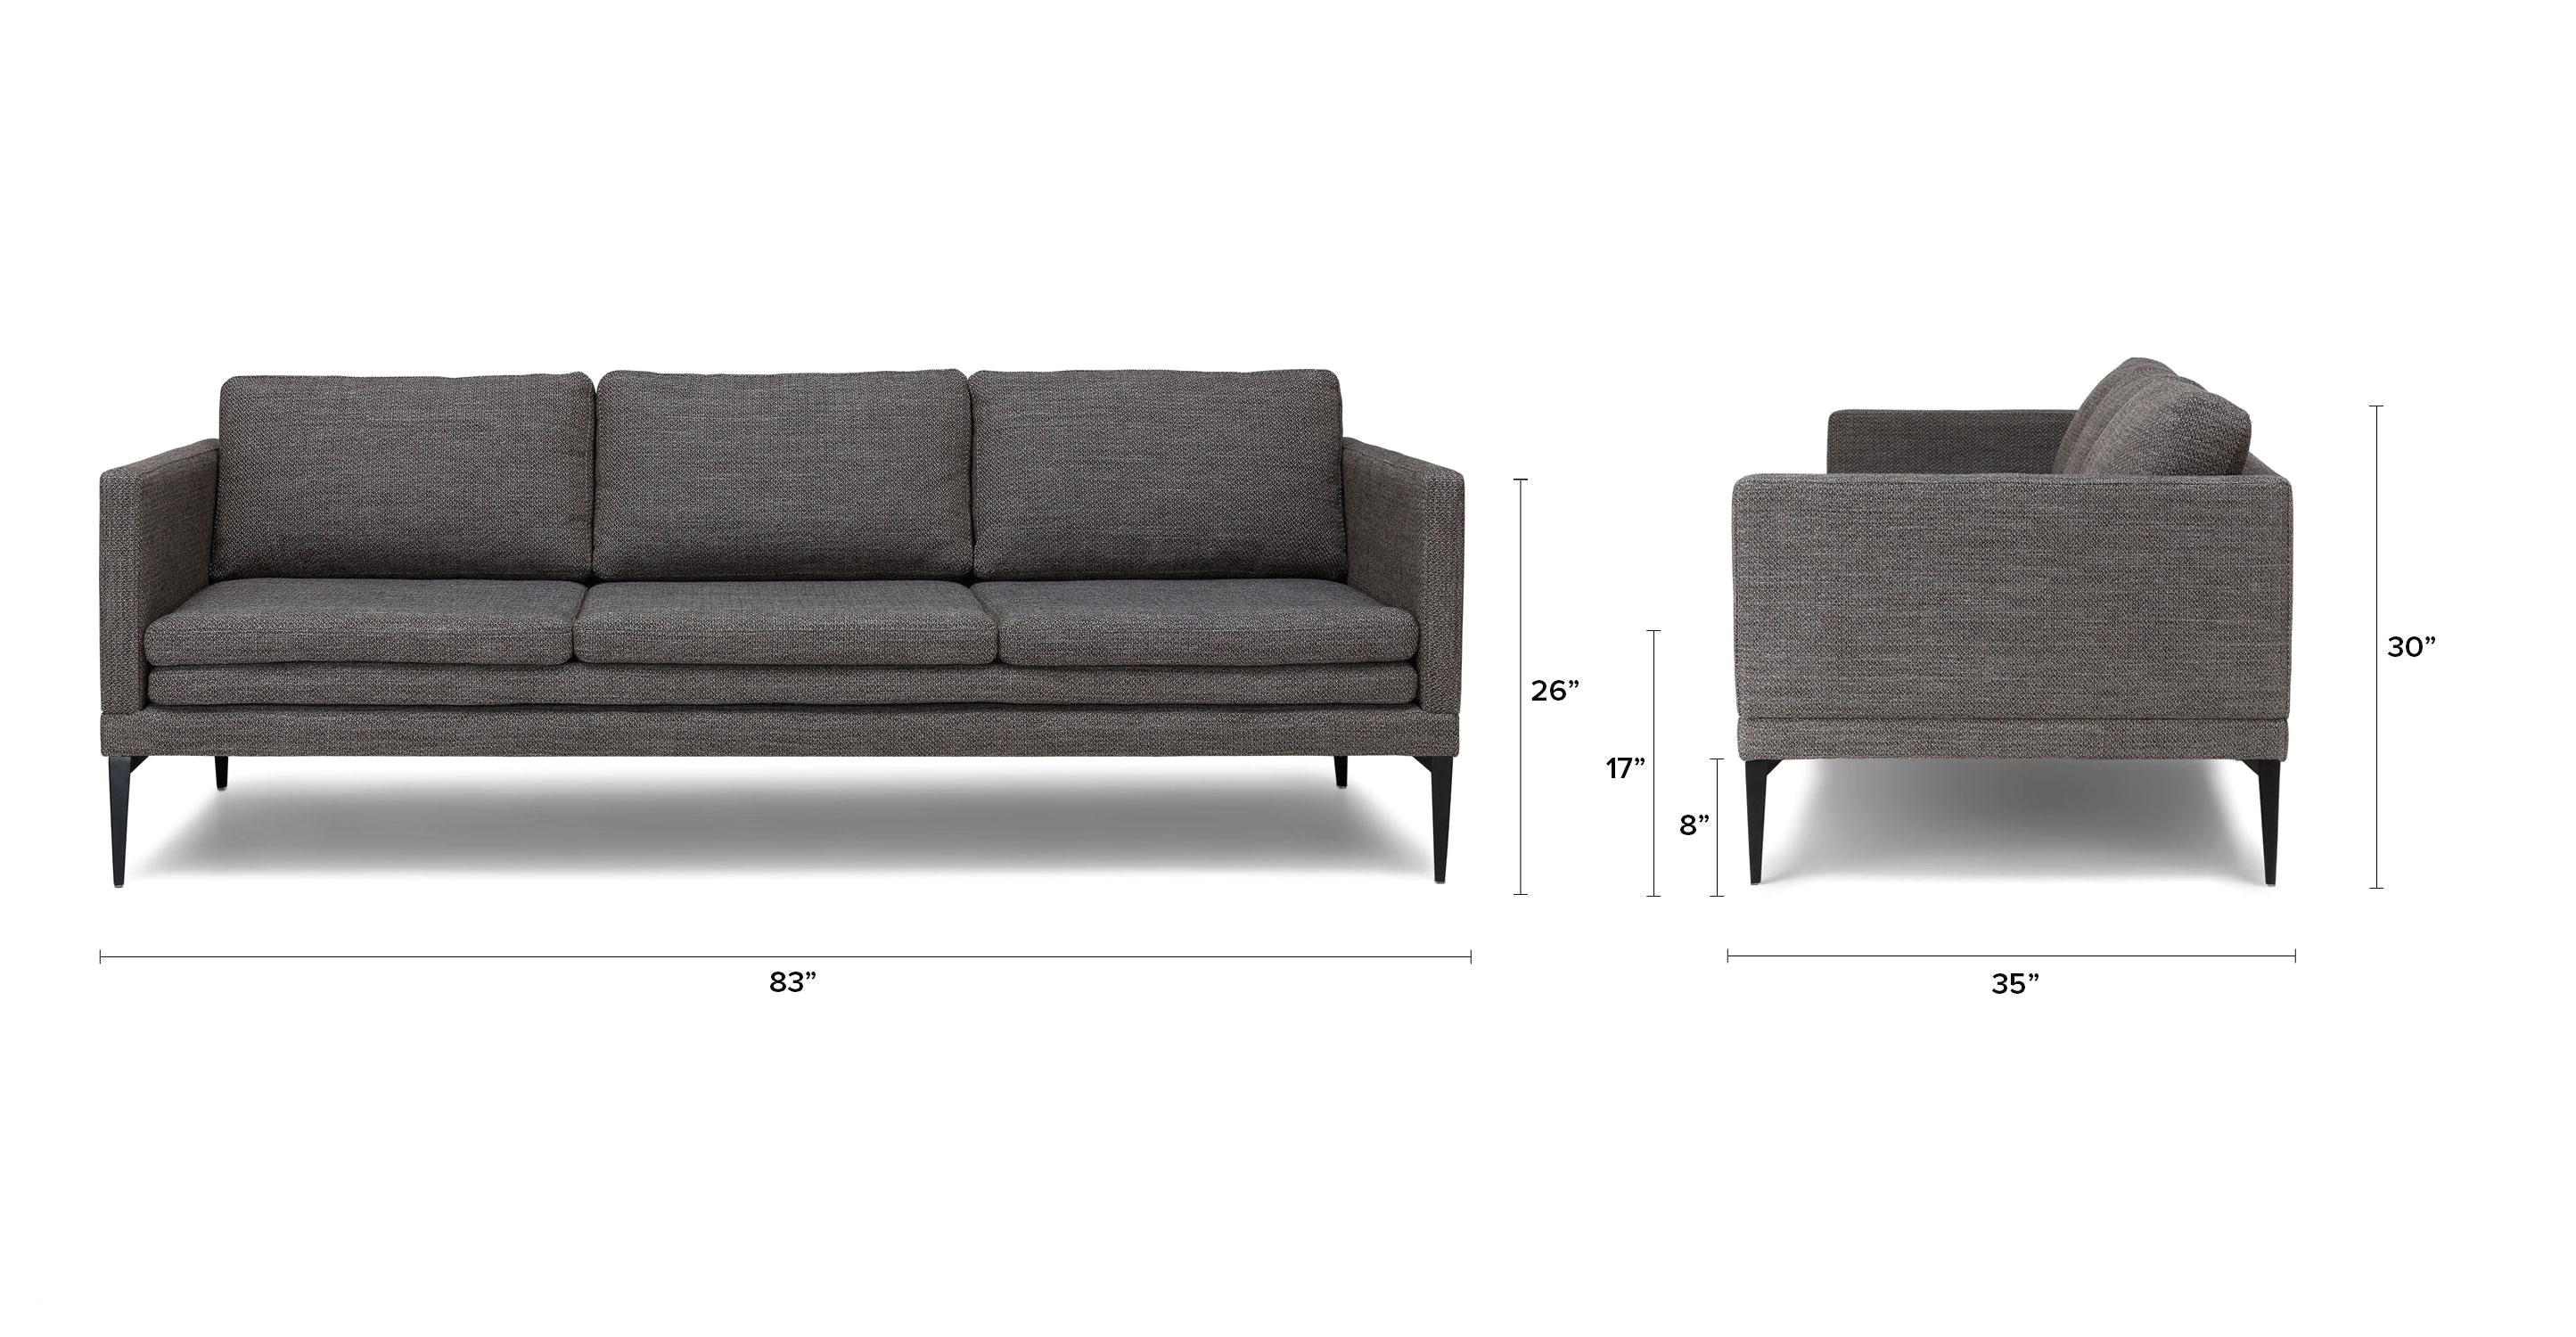 futon sofa ikea frisch sofa 140 interior 50 inspirational ikea sofa ideas ikea sofa 0d home